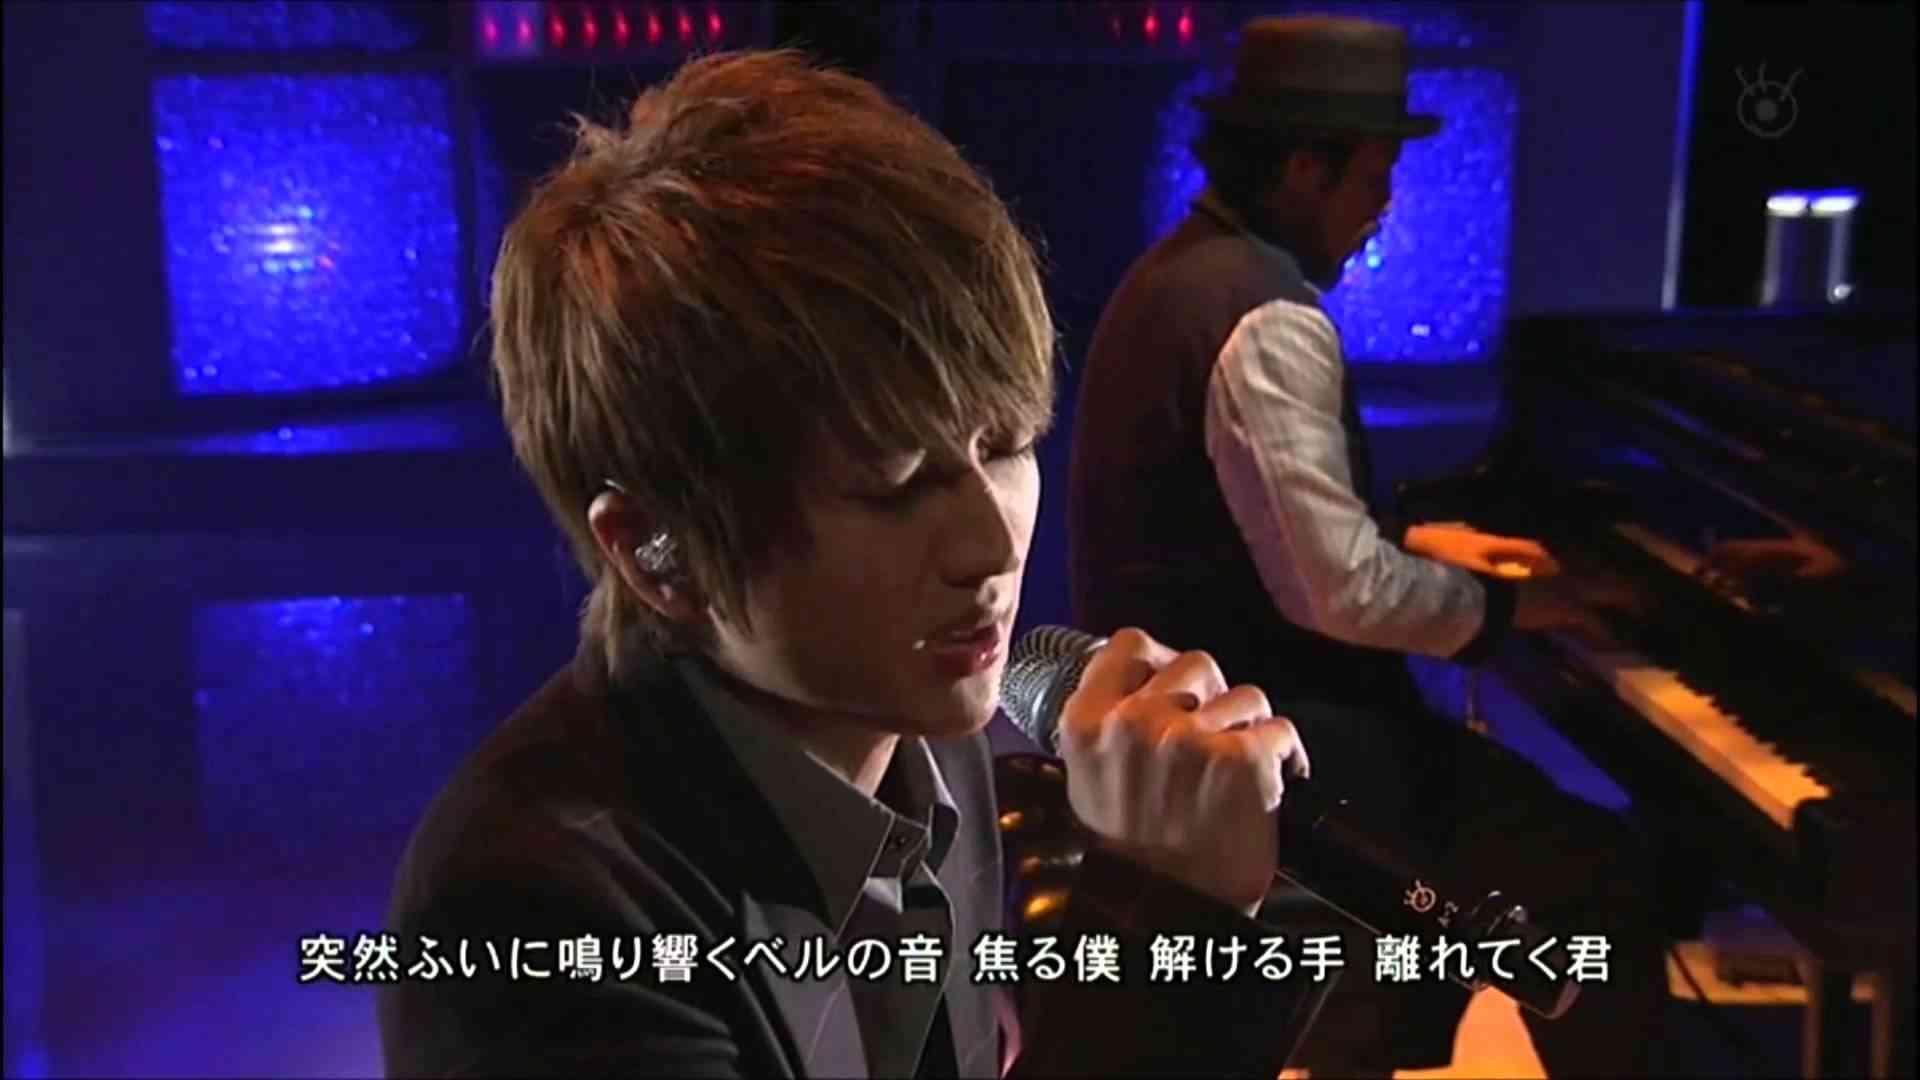 AAA 西島隆弘(AAA)×スキマスイッチ『奏』 - YouTube